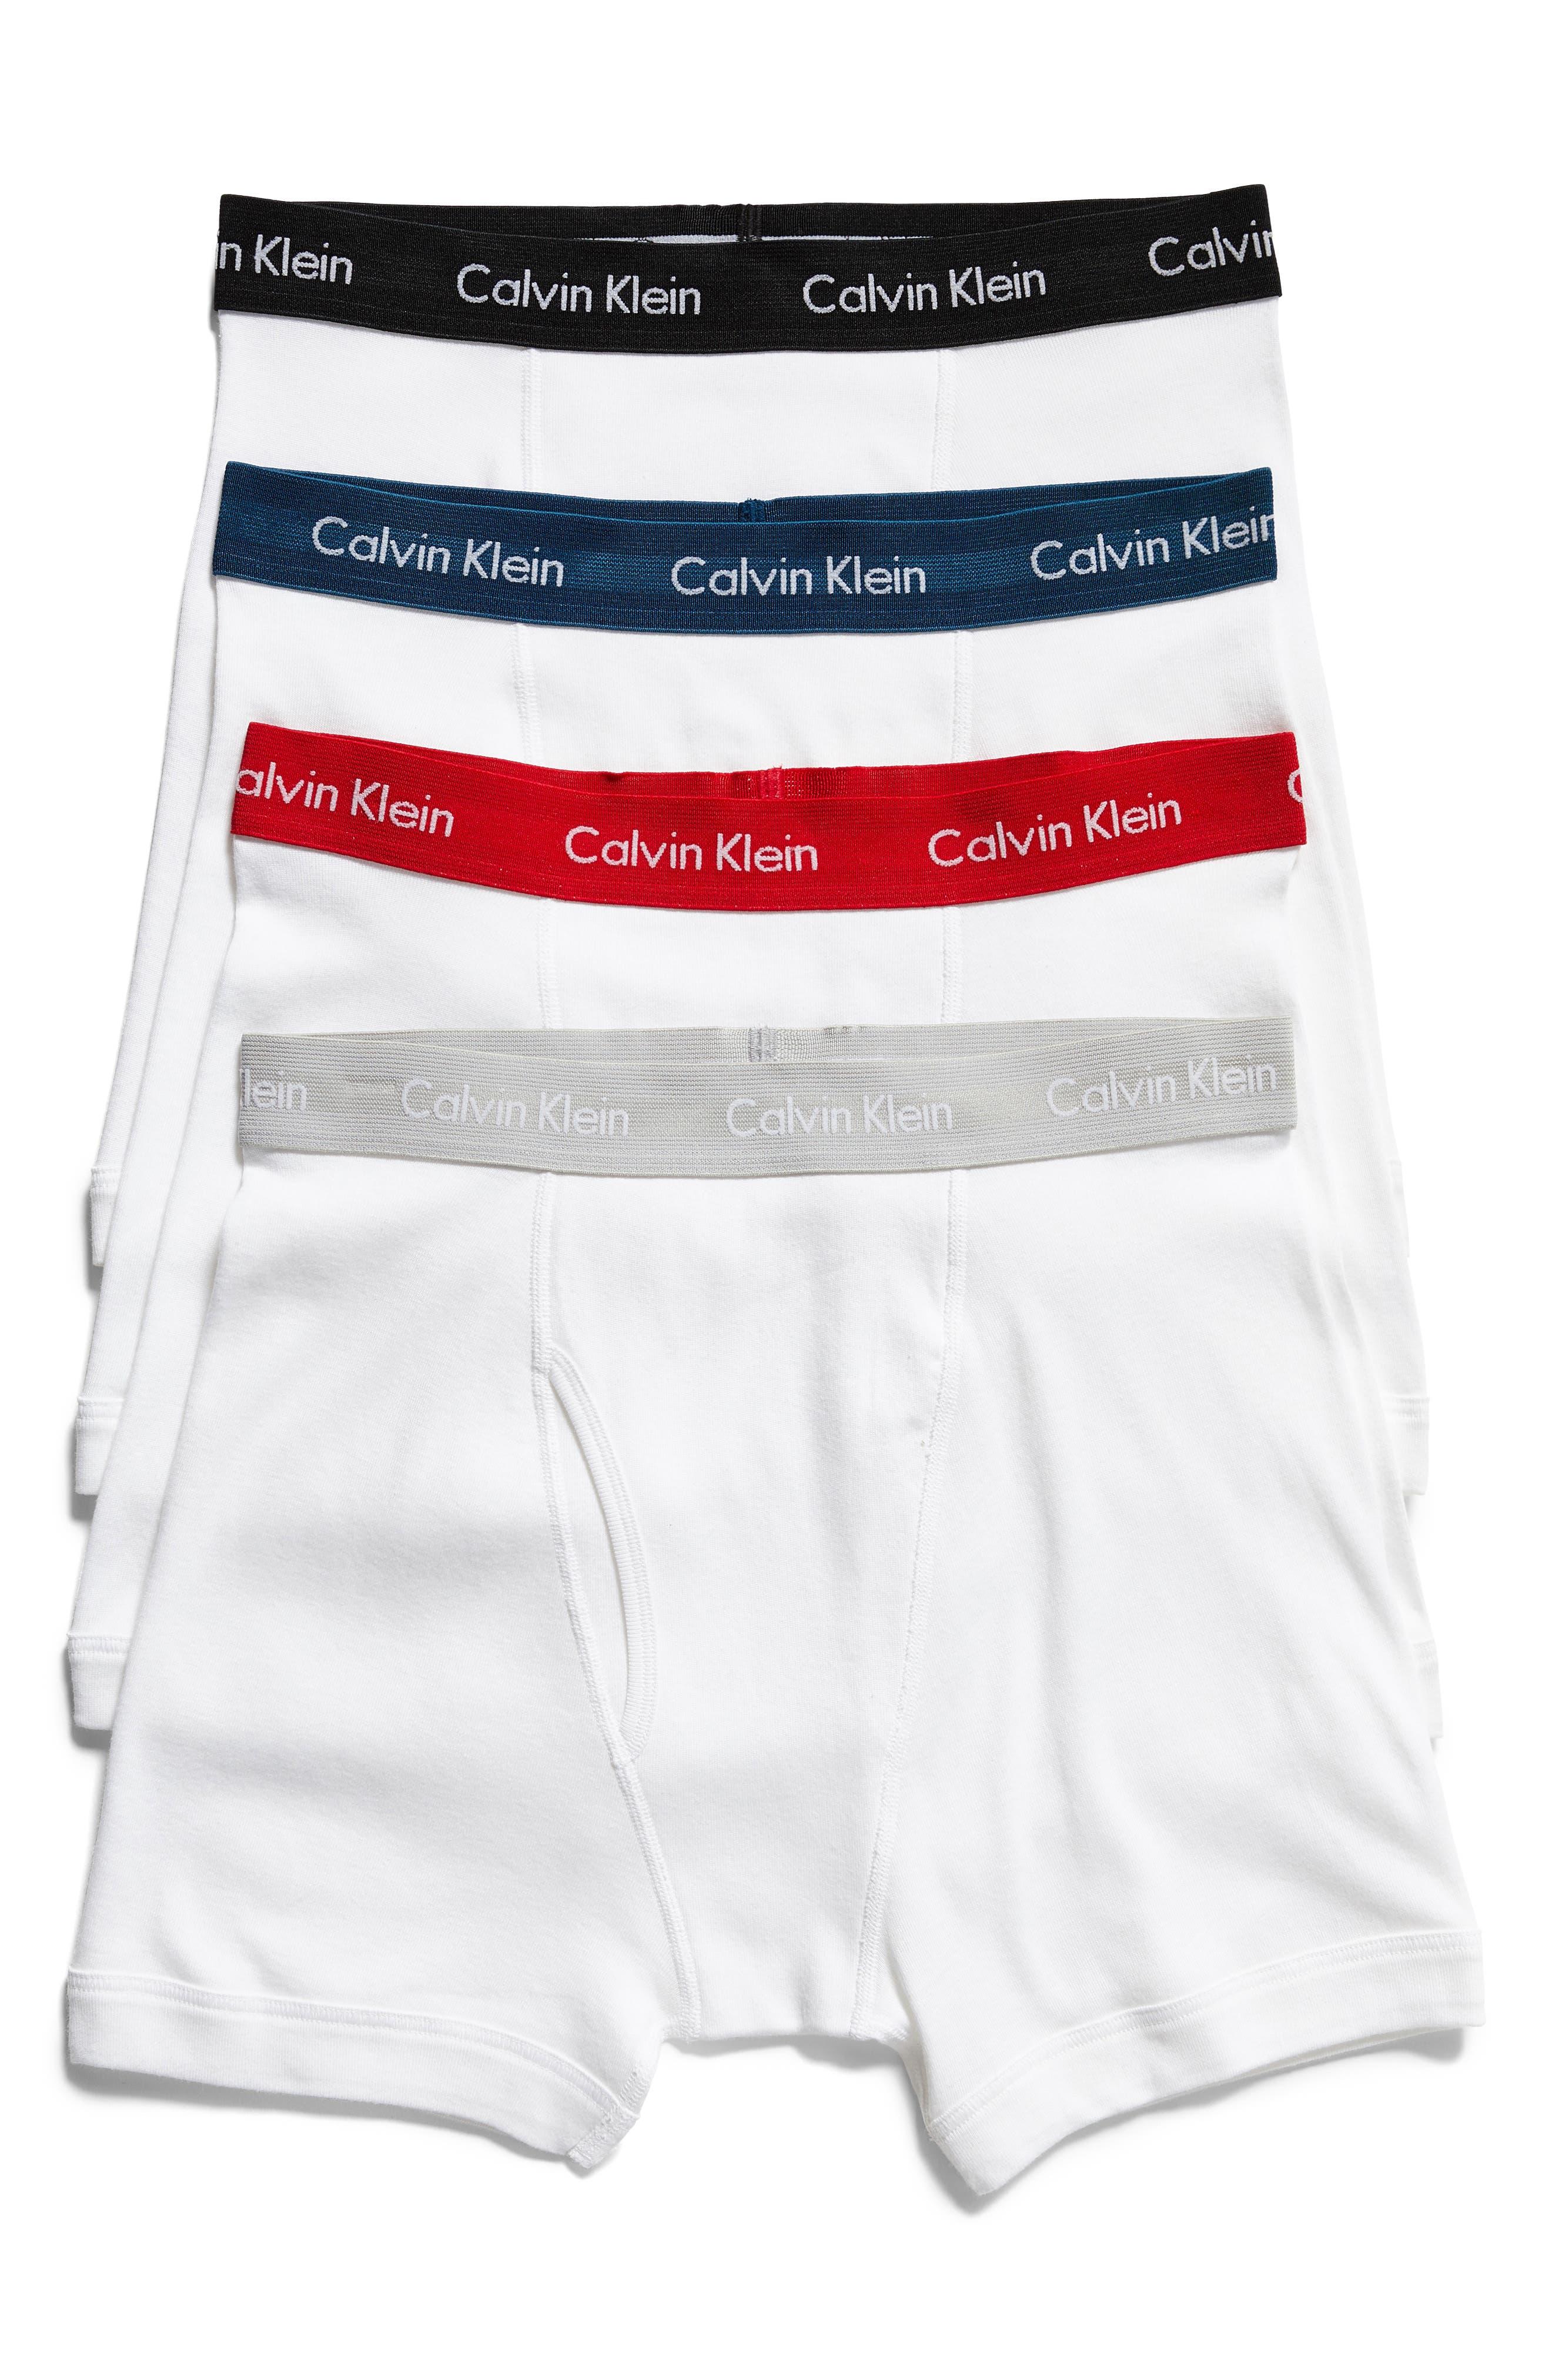 Alternate Image 1 Selected - Calvin Klein Classic 4-Pack Cotton Boxer Briefs